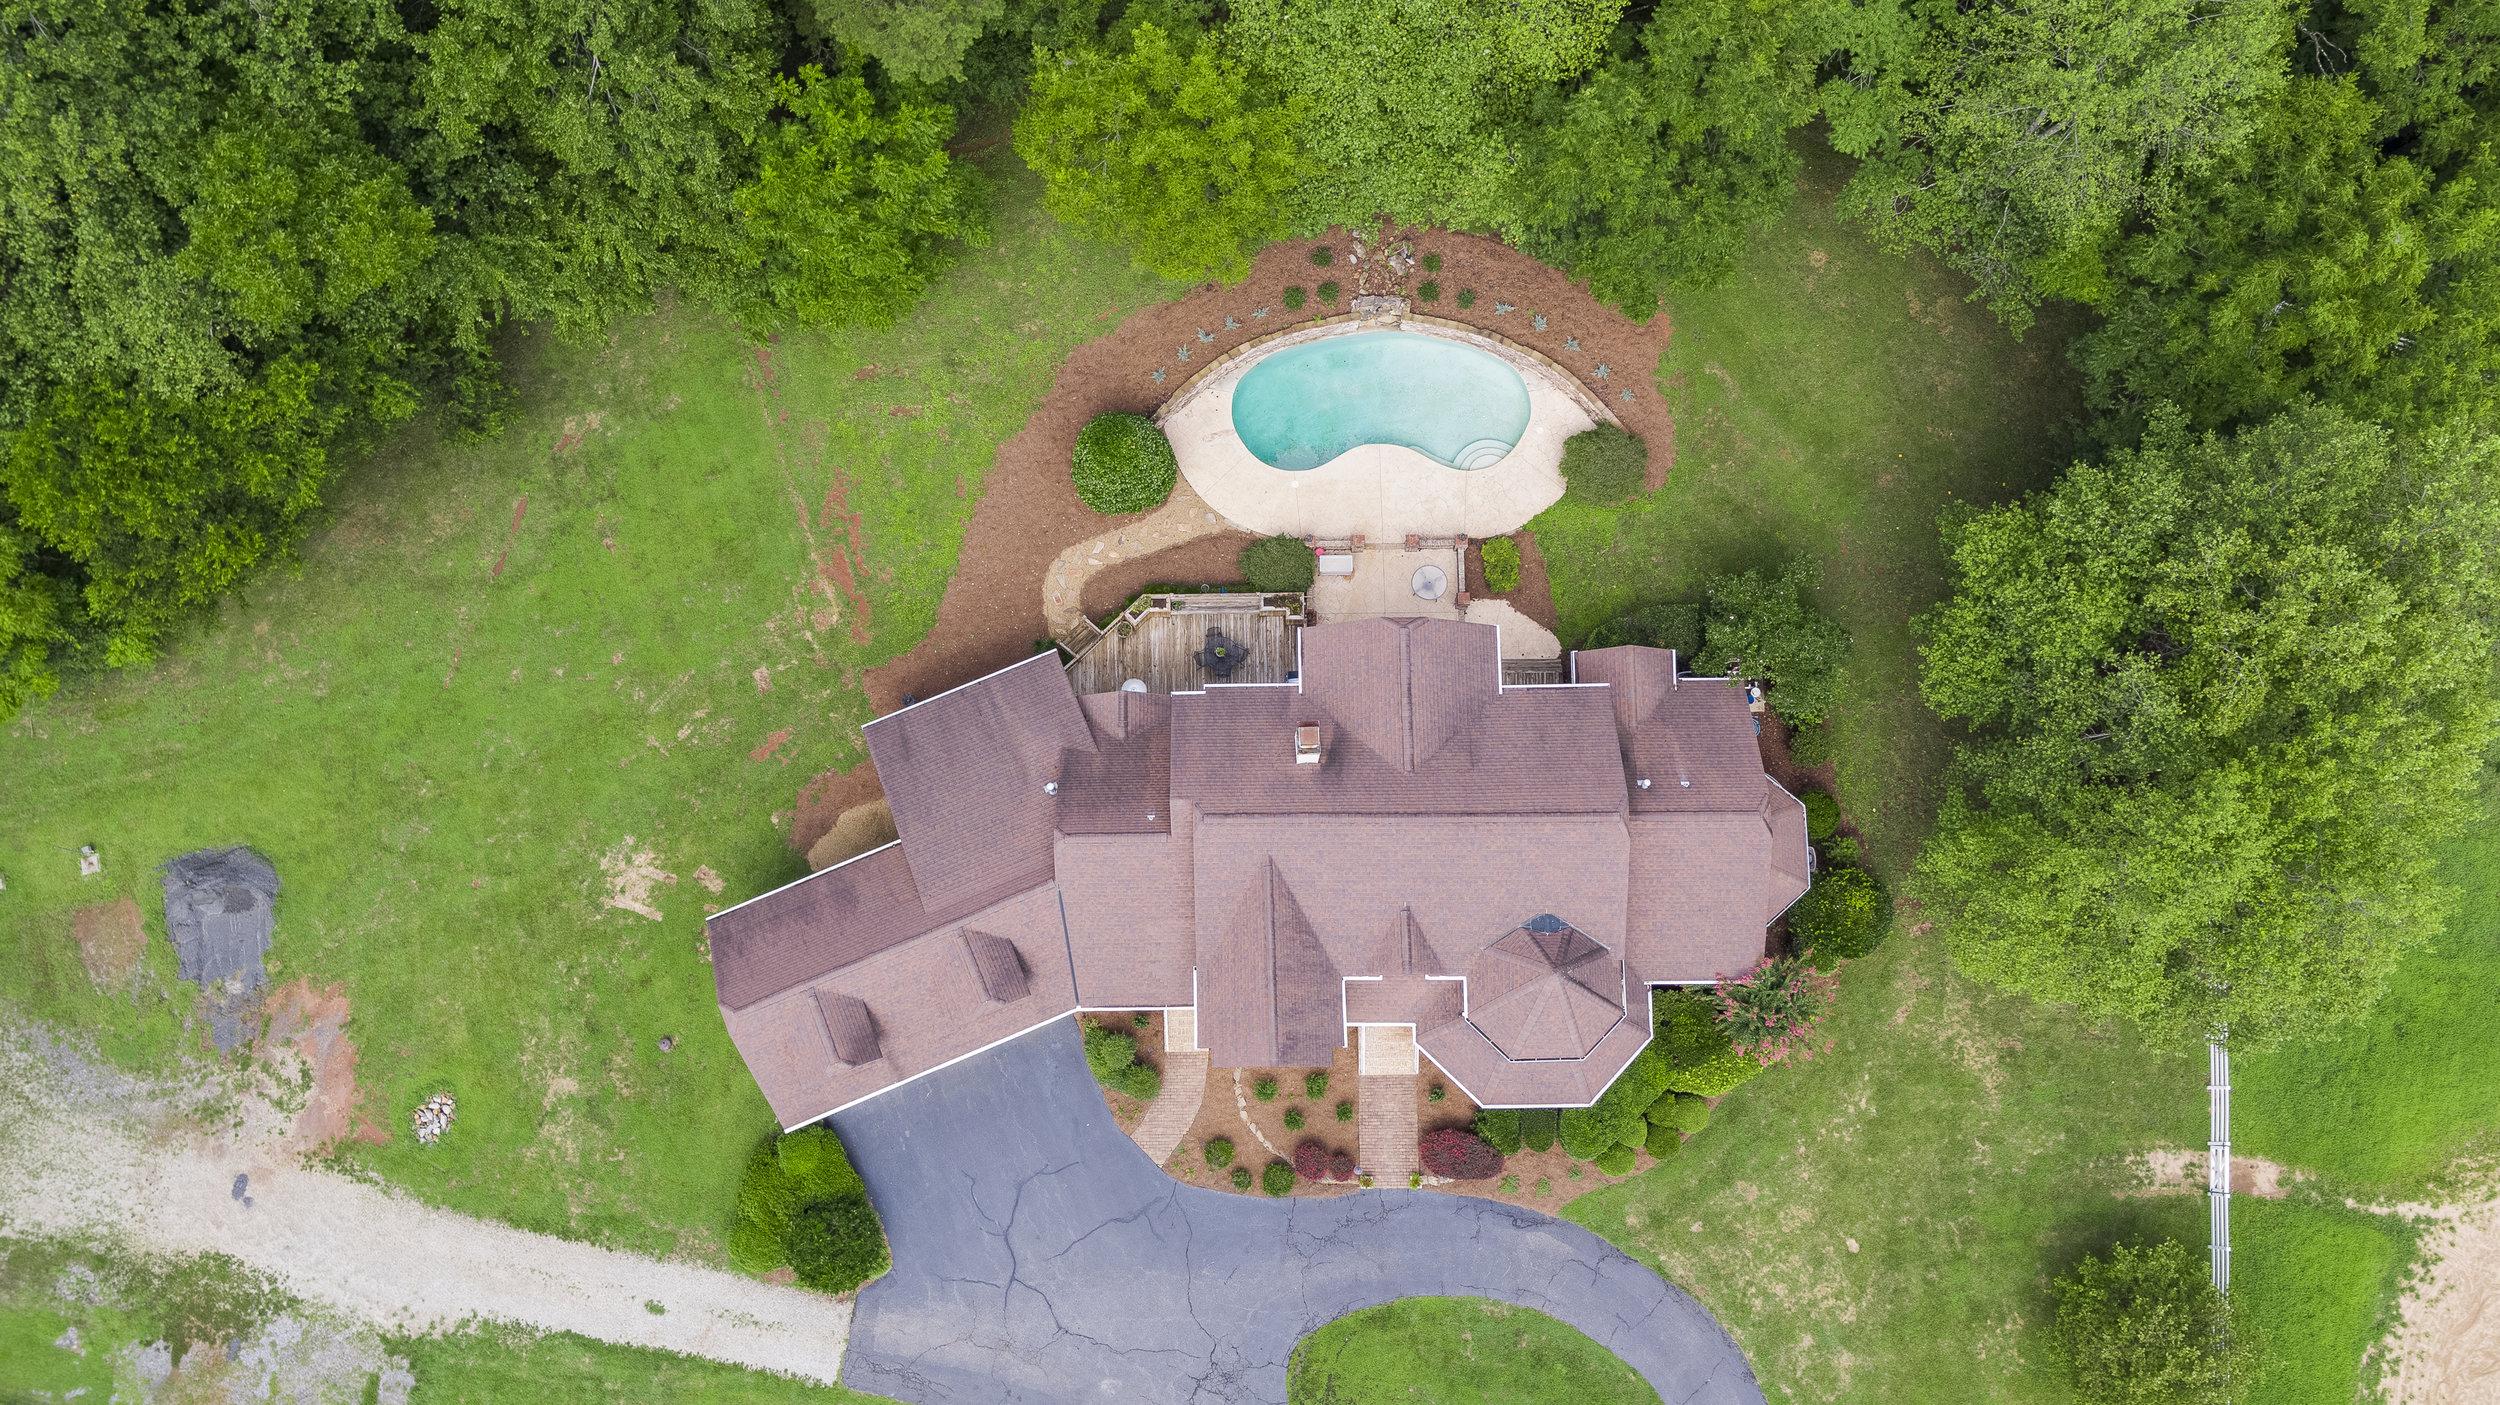 real-estate-photography-drone-photographer-drone-greensboro-nc-triad-214.jpg